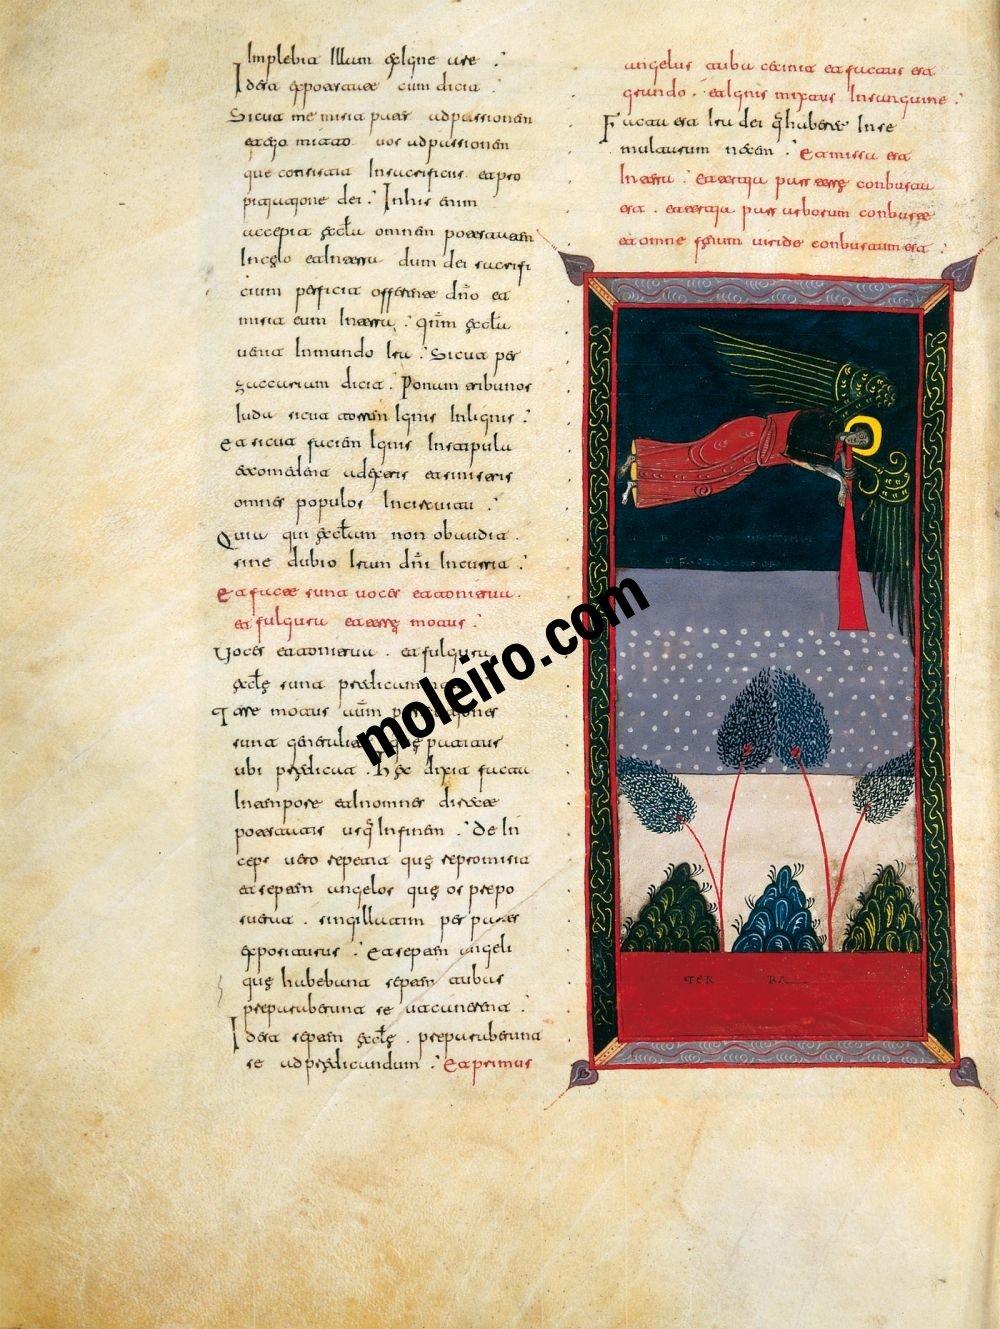 The Facundus Beatus f. 163v